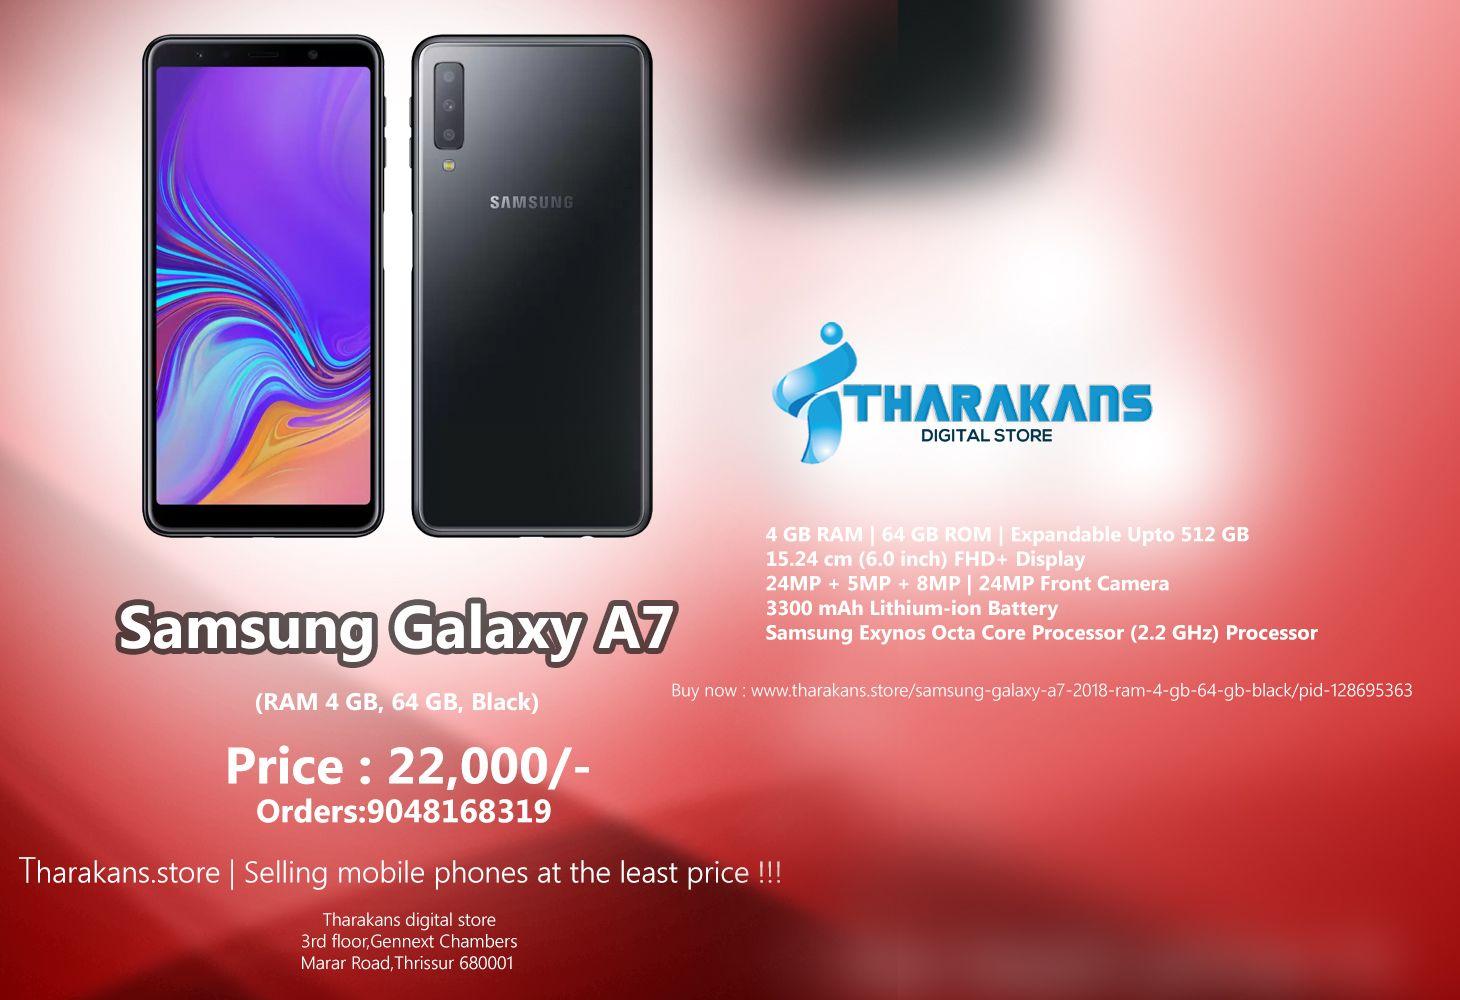 Samsung Galaxy A7 -->>Price:22,000/- (RAM 4 GB, 64 GB, Black